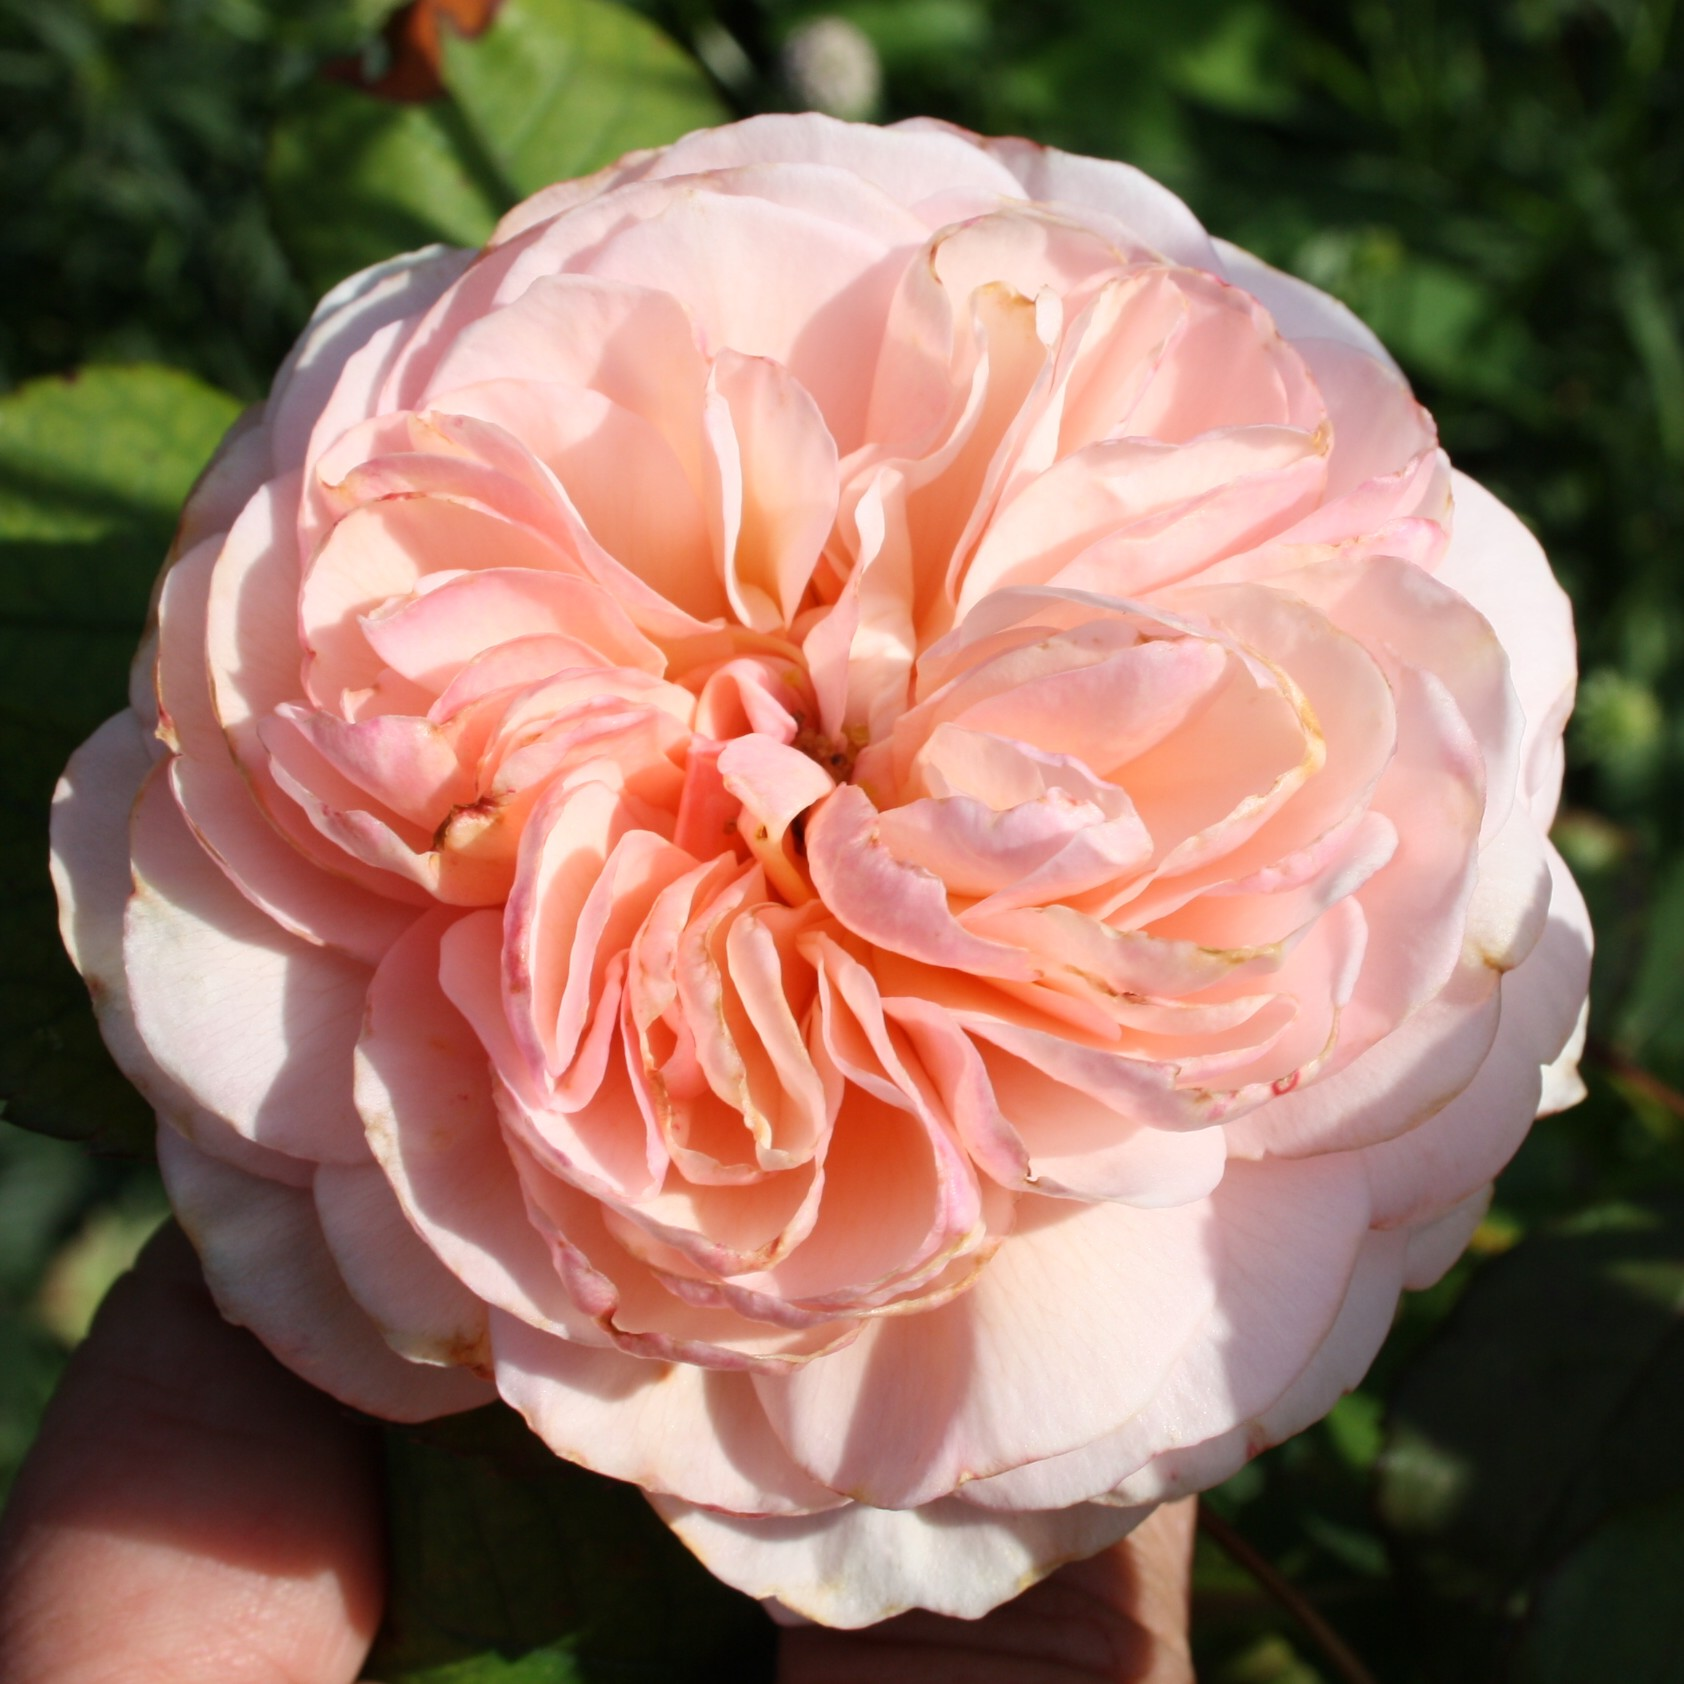 Rose - A Shropshire Lad